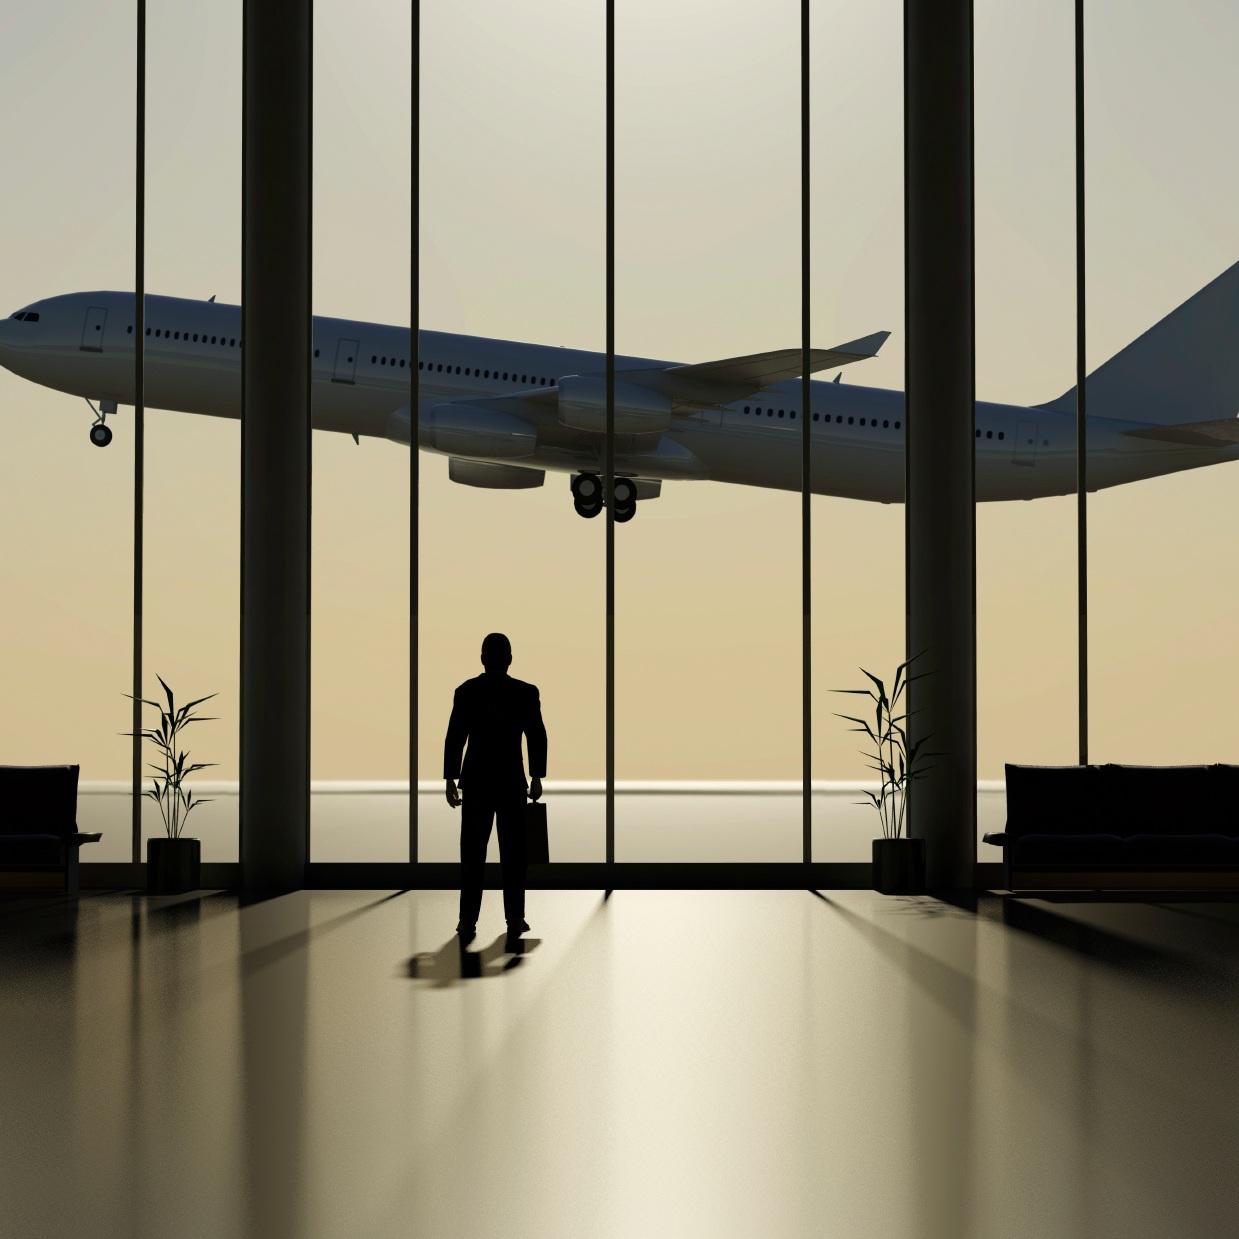 iStock_AirportLounge_4797777Medium.jpg